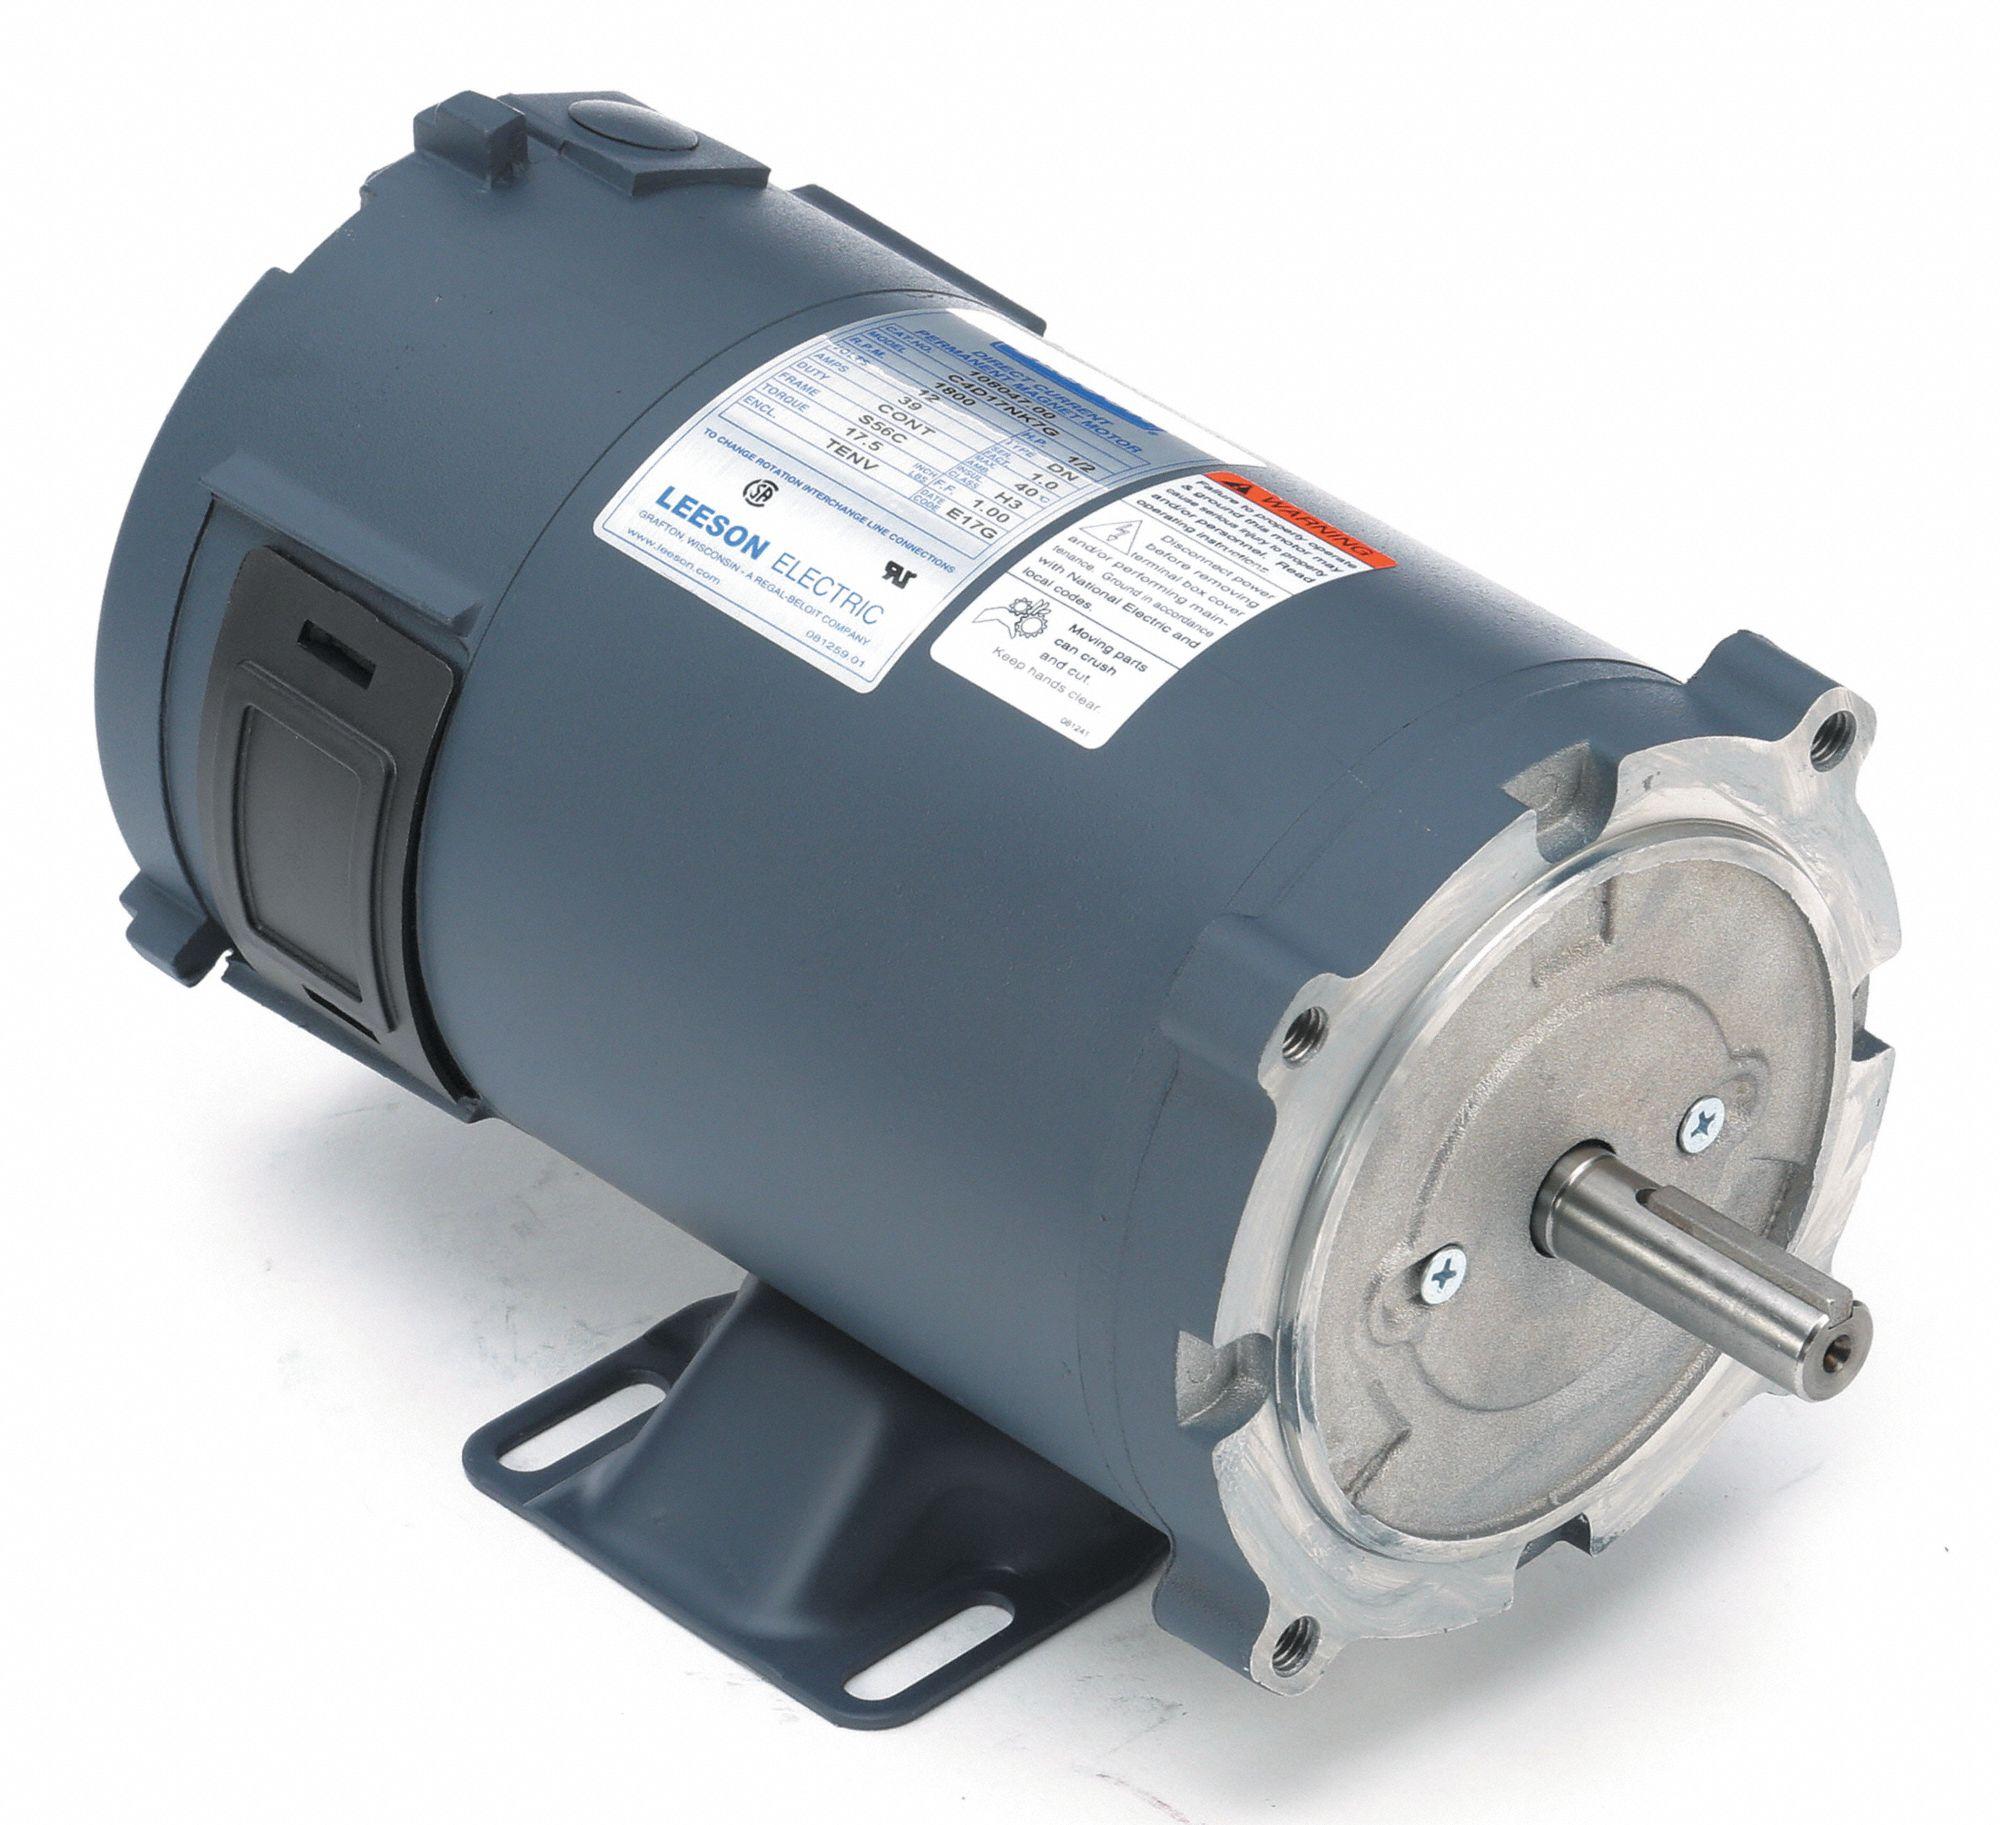 My Custom Wiring Diagramsfor Switch Panels And Hydraulic Pump Setups